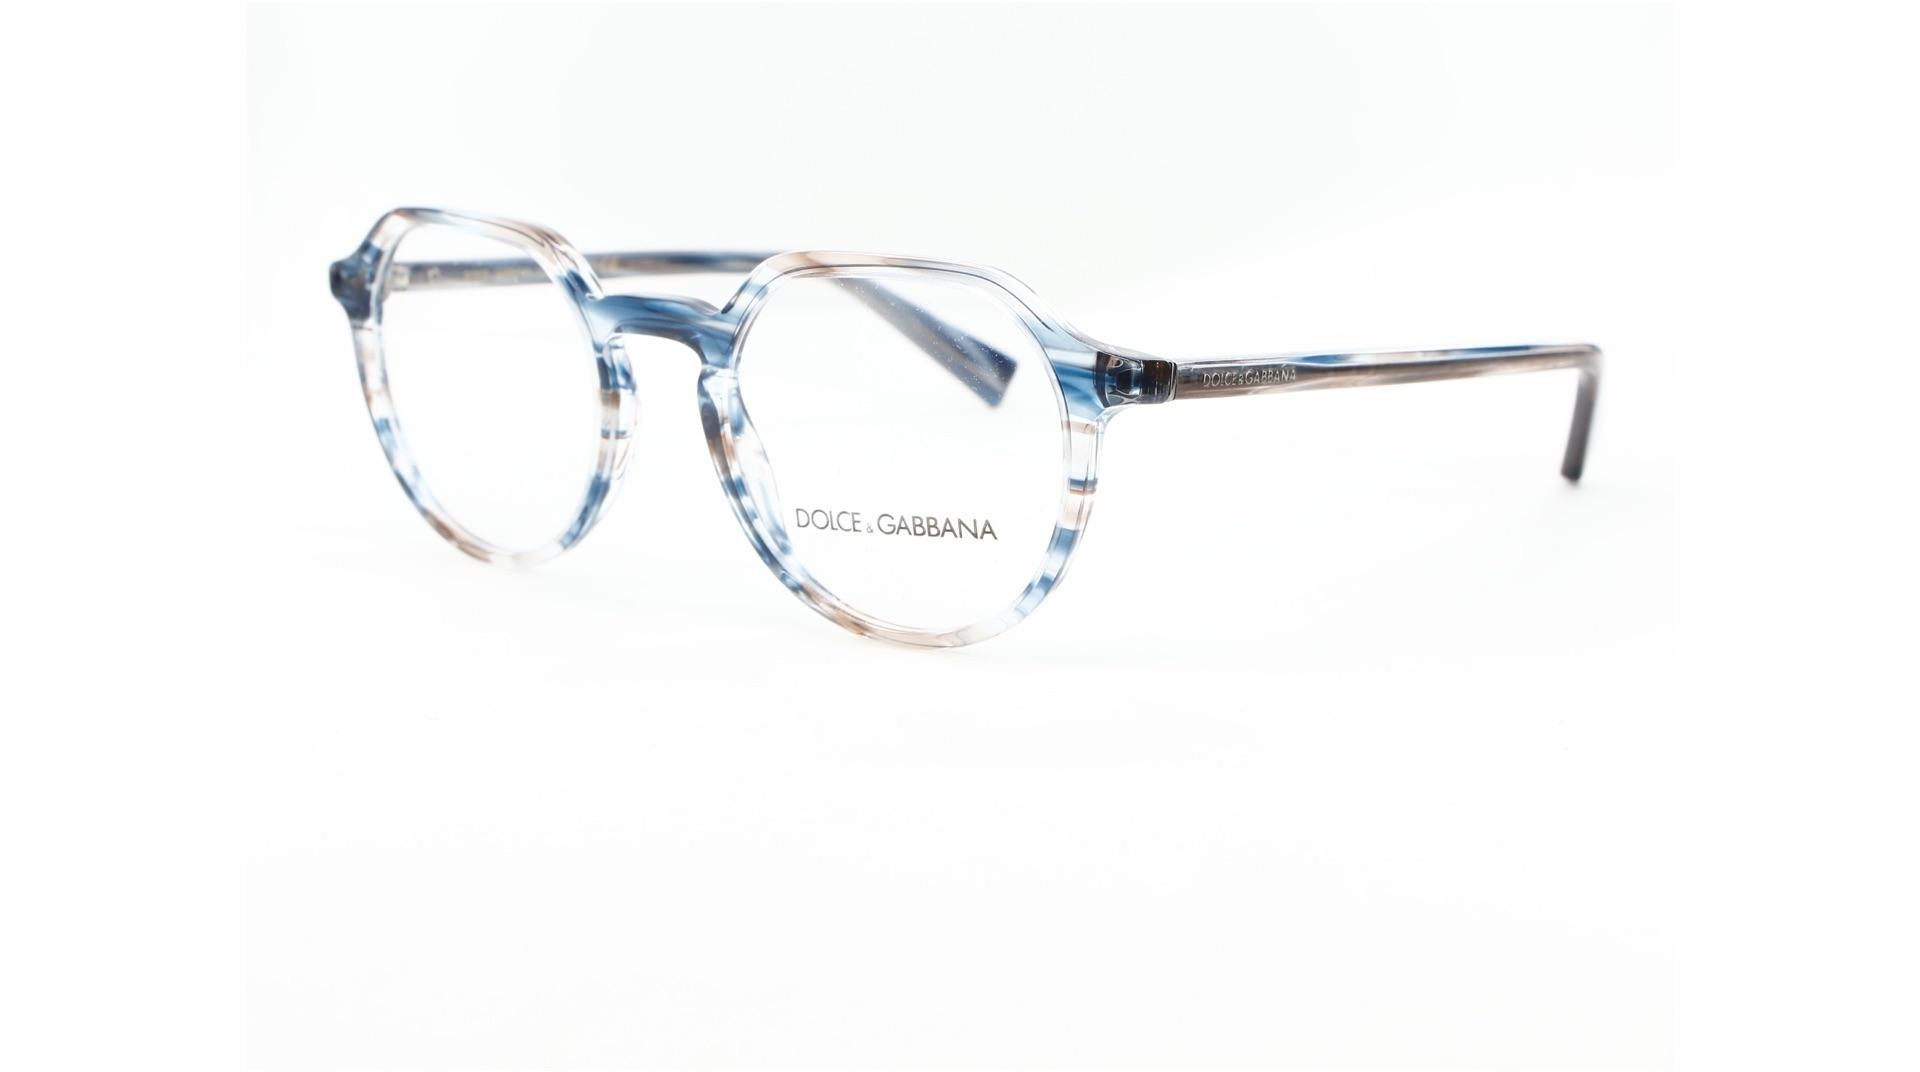 Dolce & Gabbana - ref: 80750